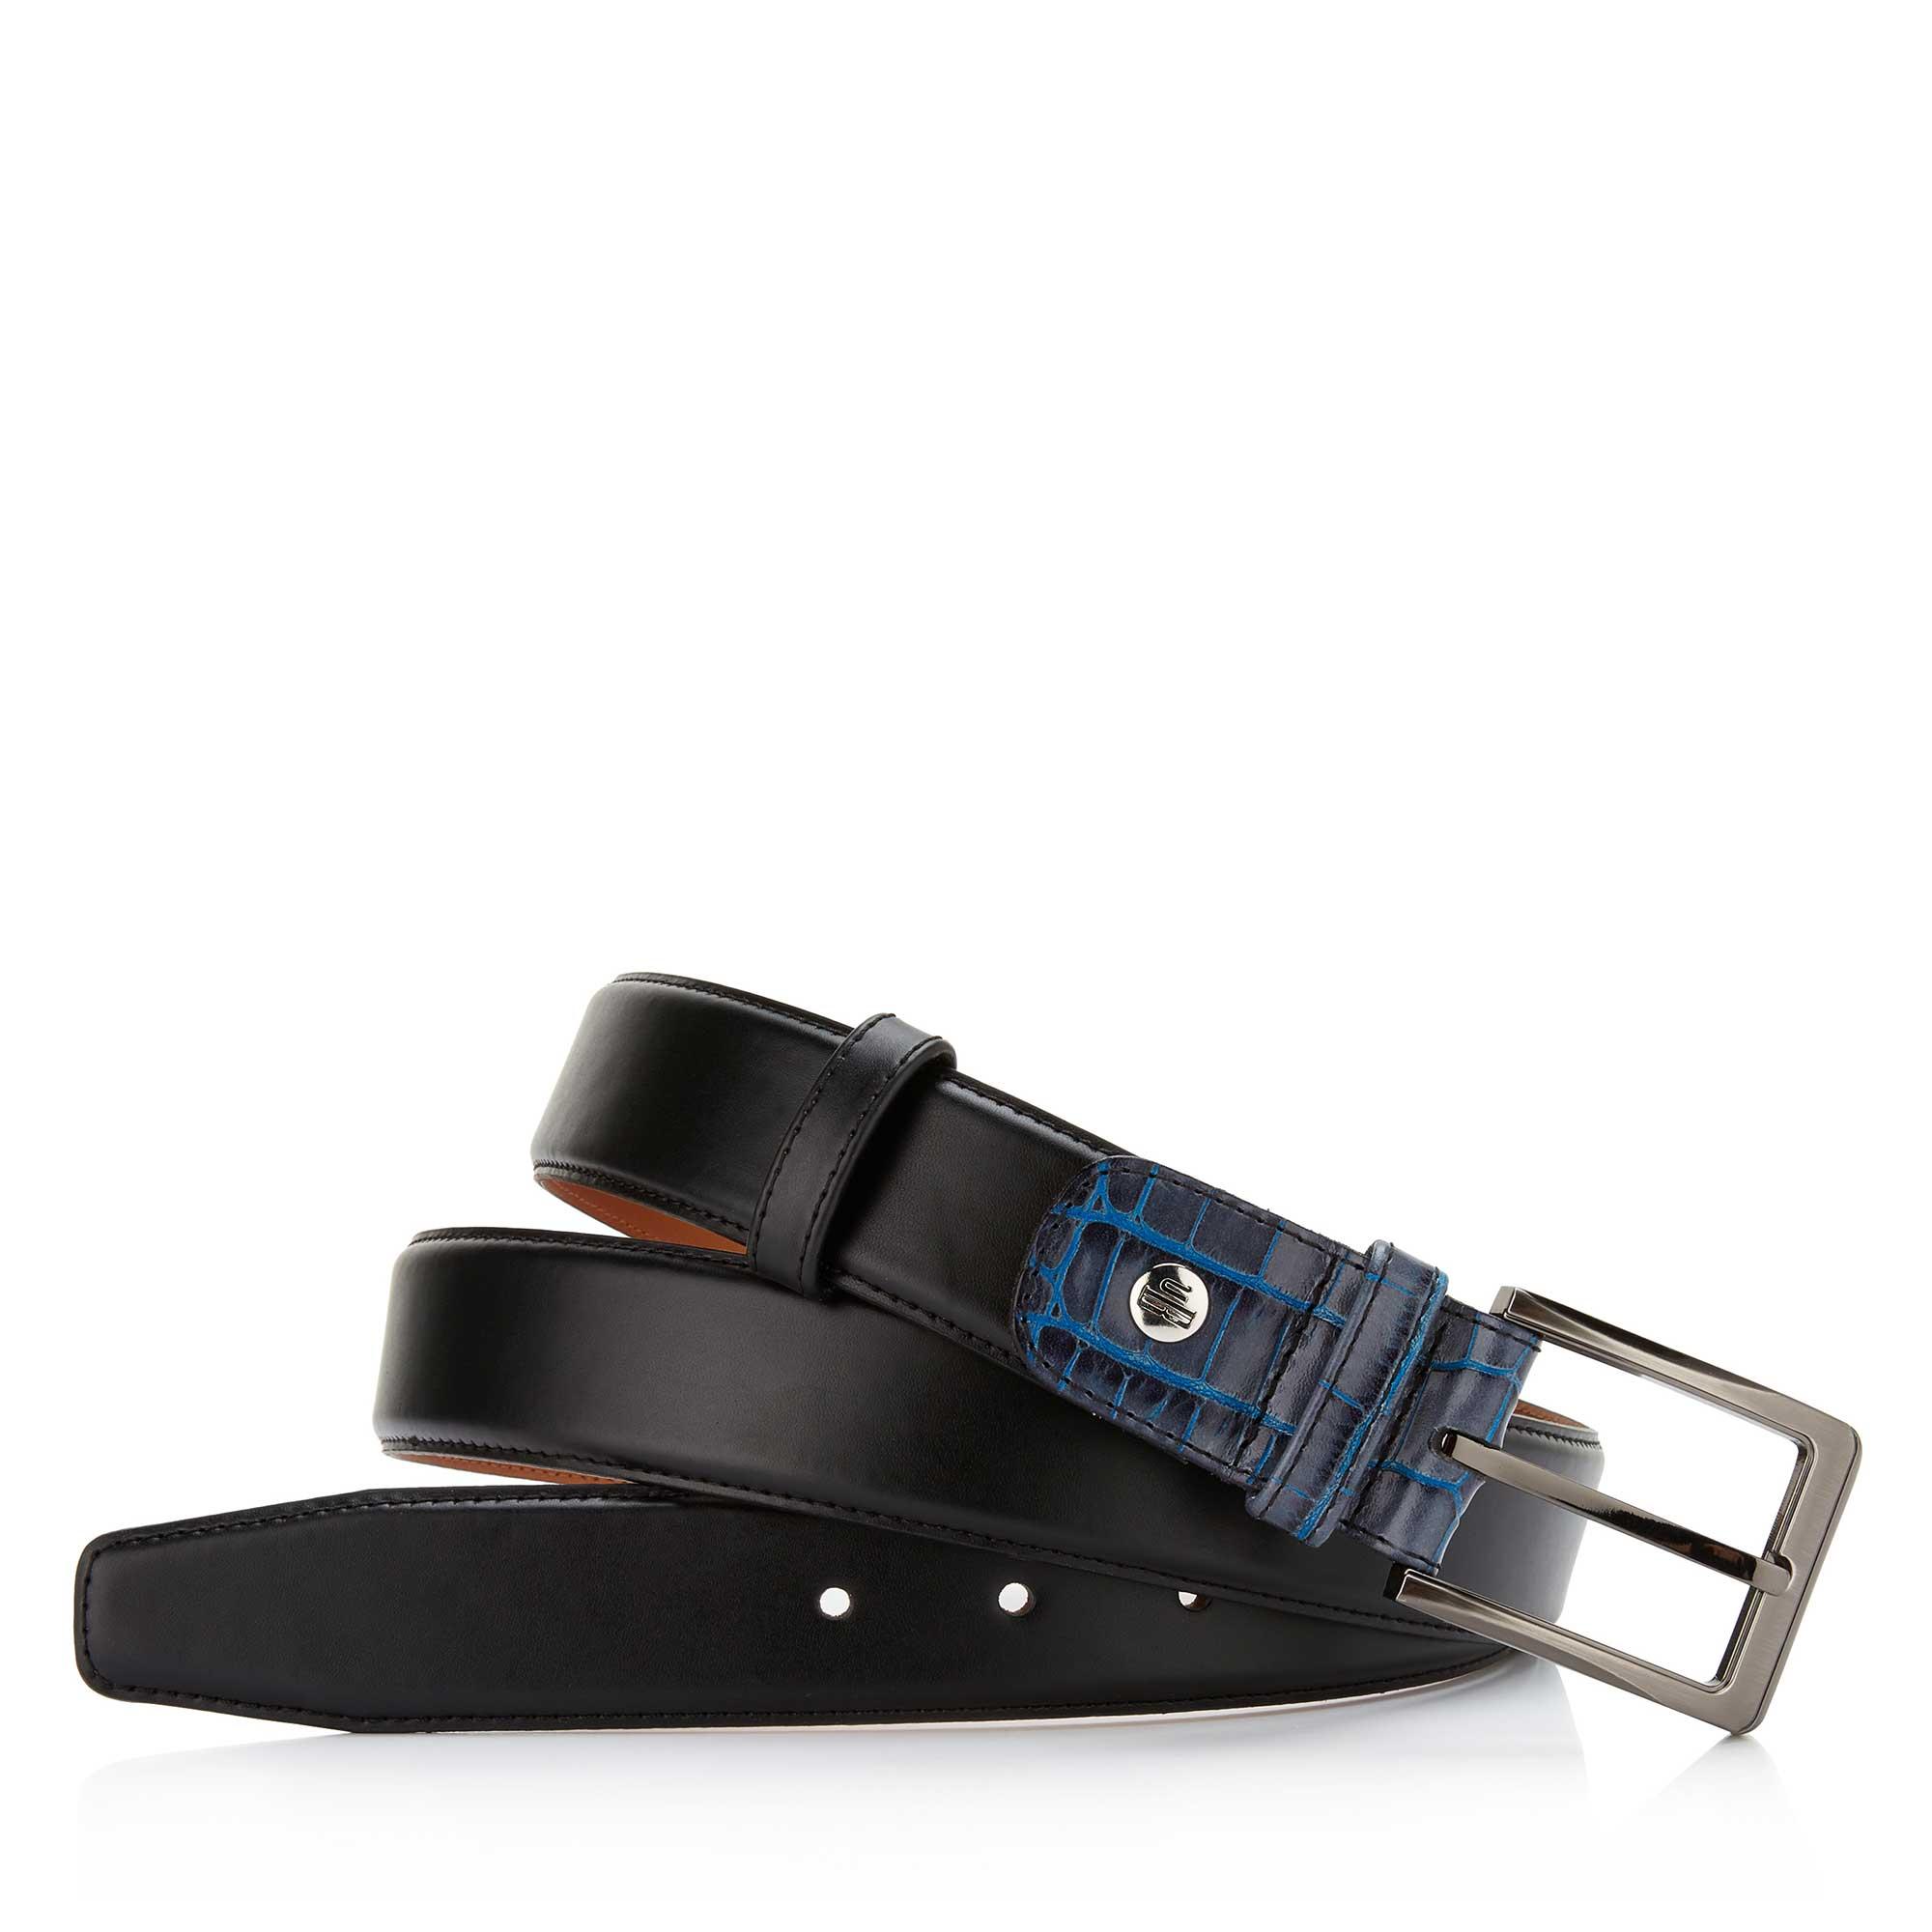 Black Leather Mens Belt 7505501 Floris Van Bommel